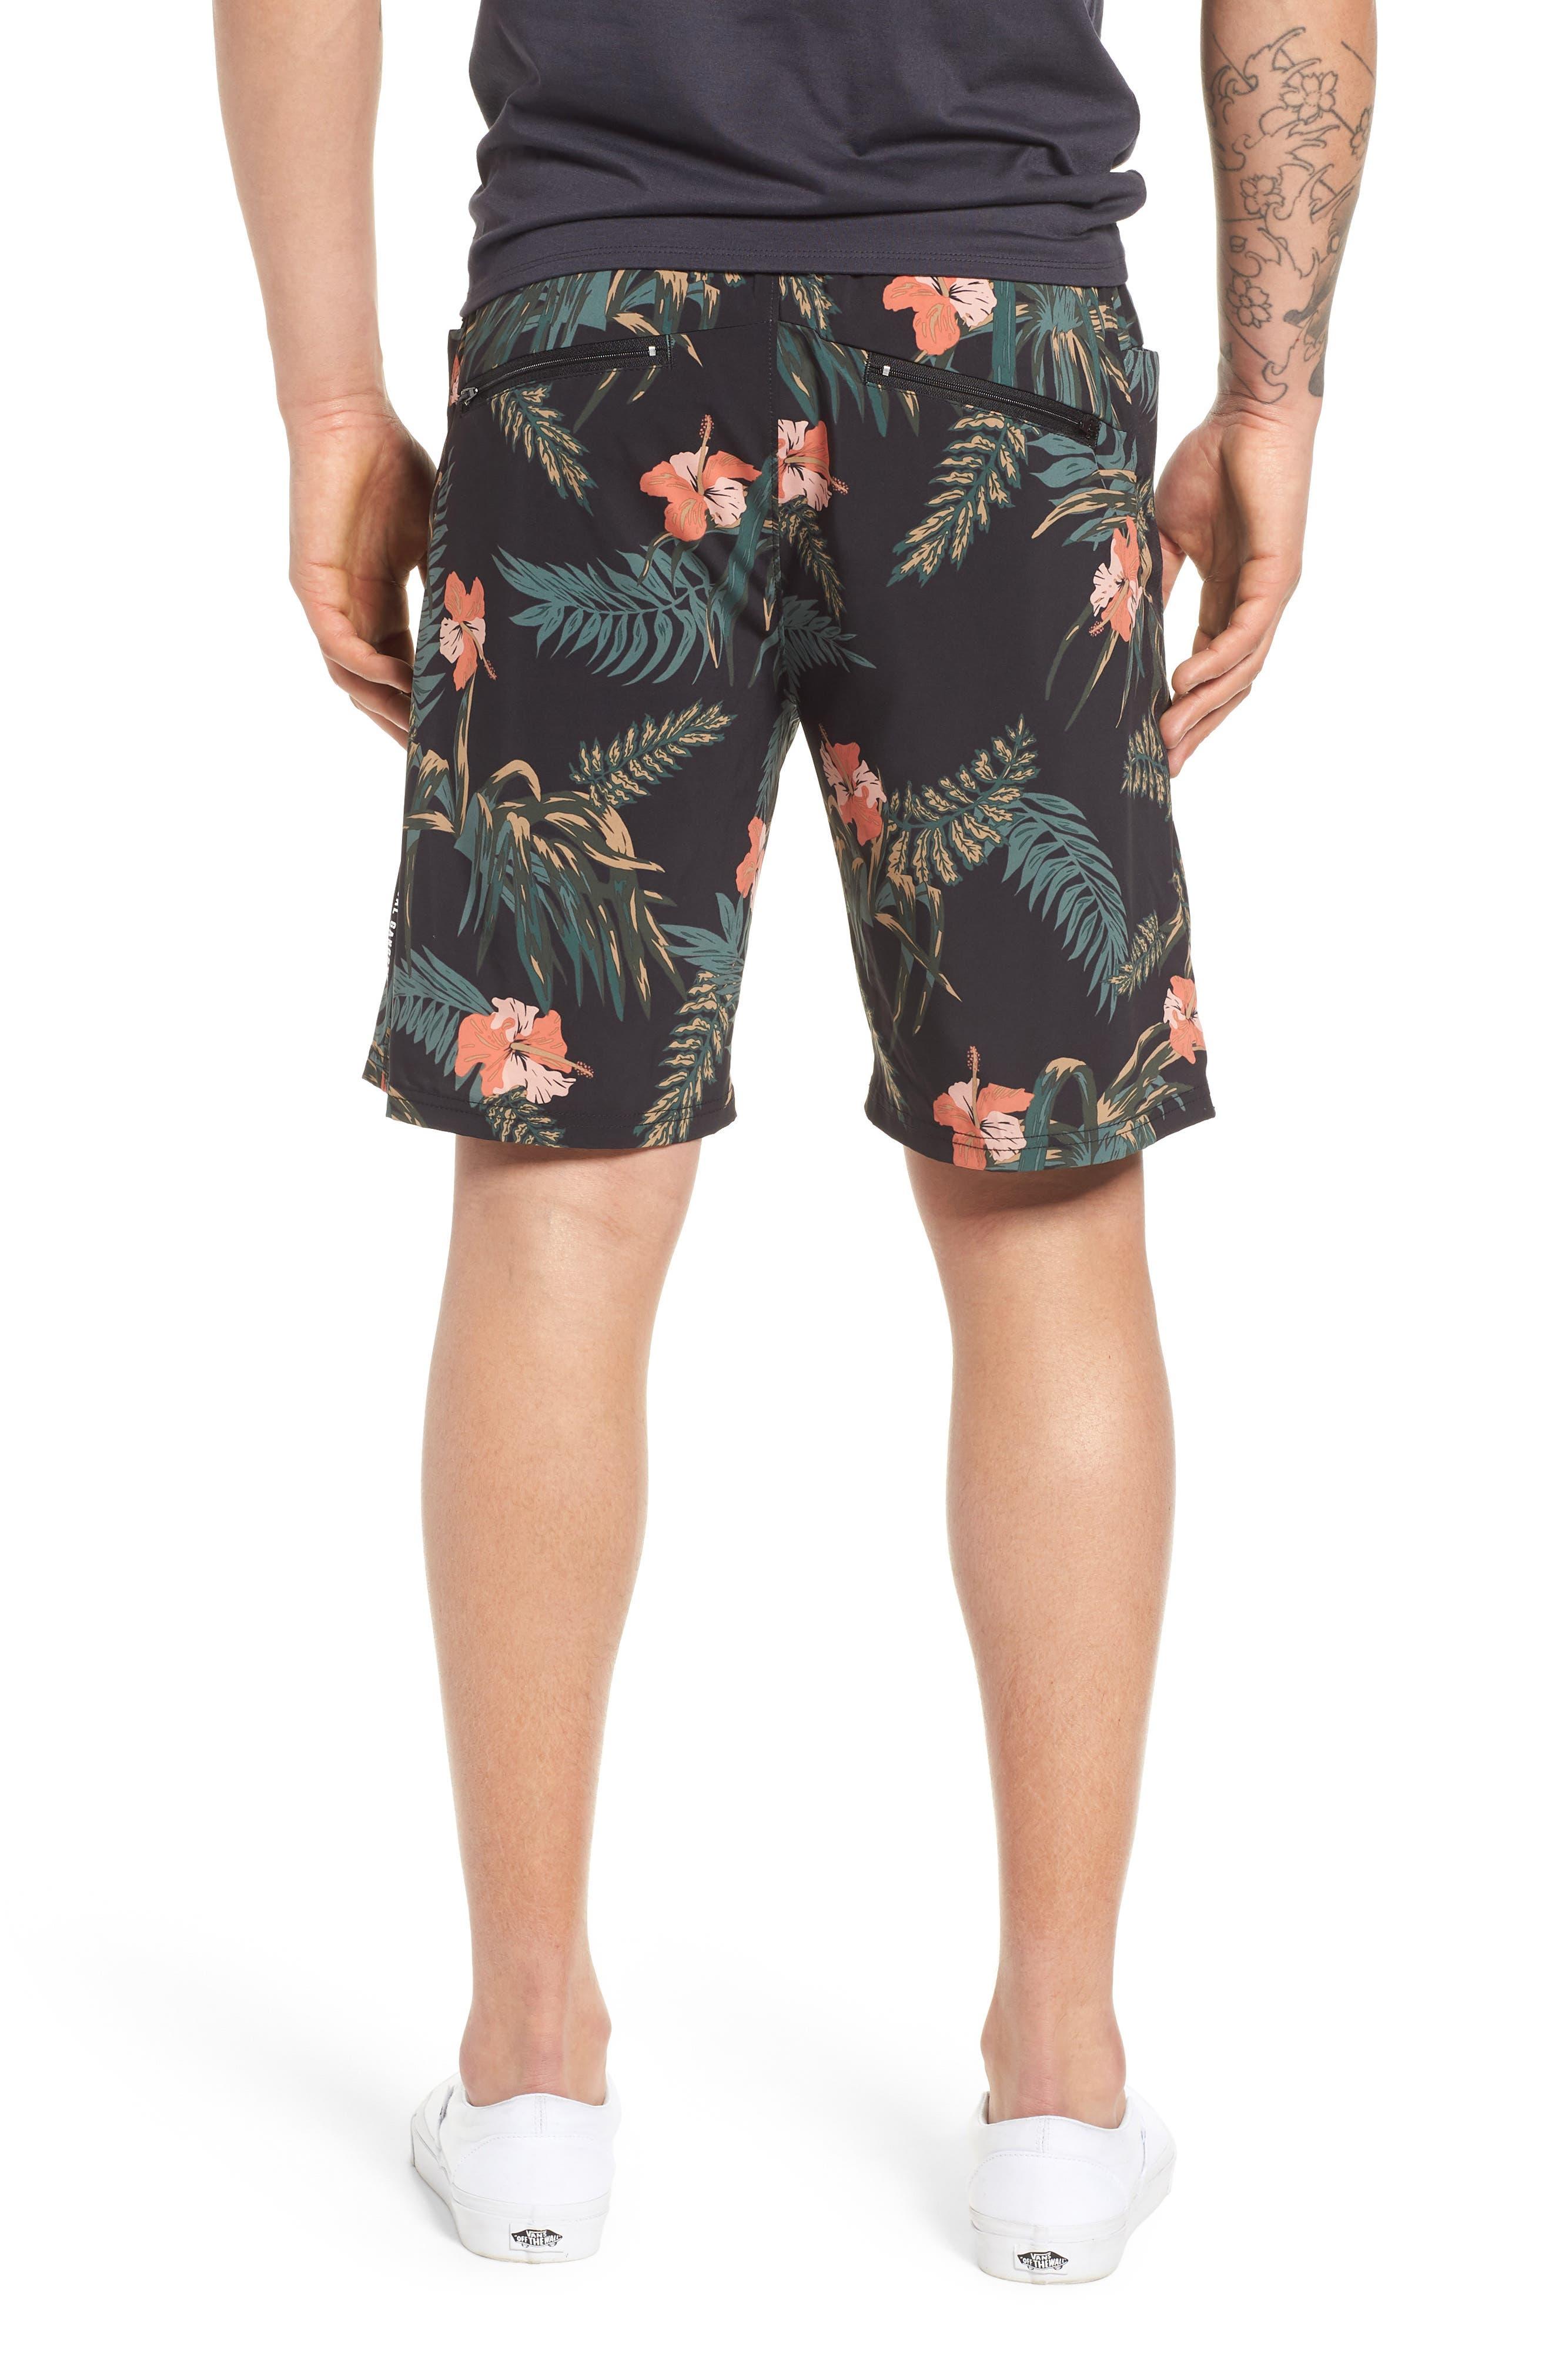 Ignite Shorts,                             Alternate thumbnail 2, color,                             Floral/ Multi